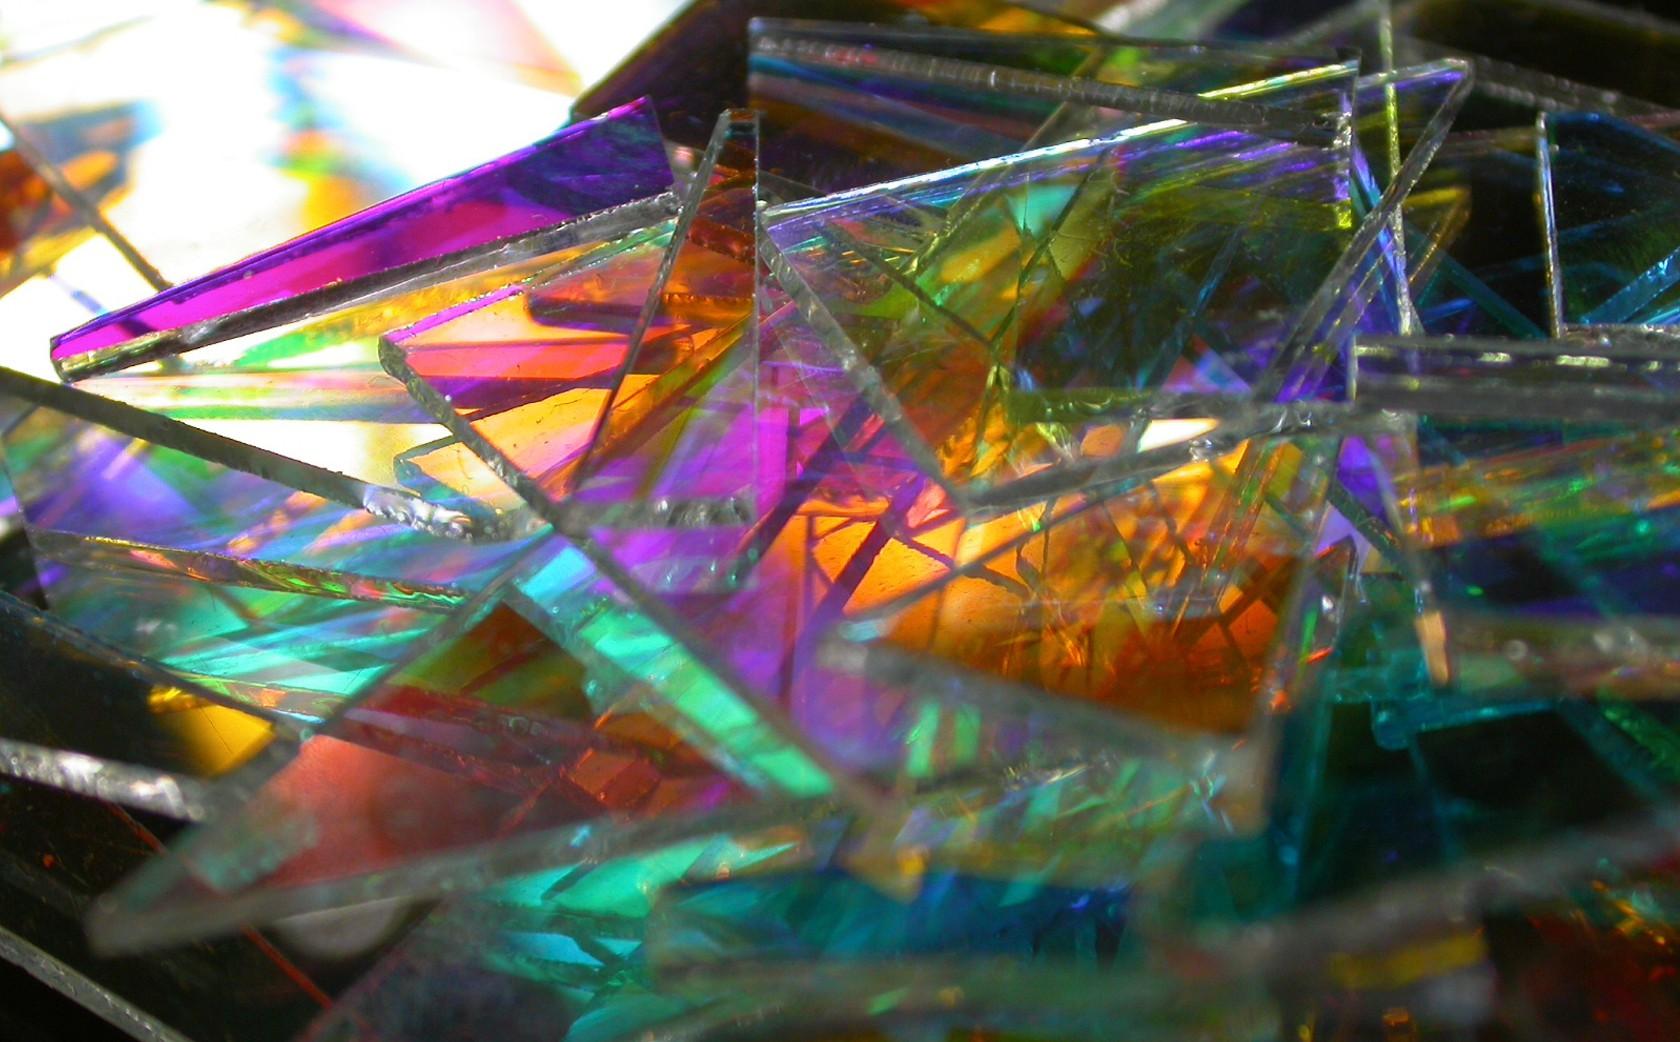 Dichroic Glass Artist Light Paqintings